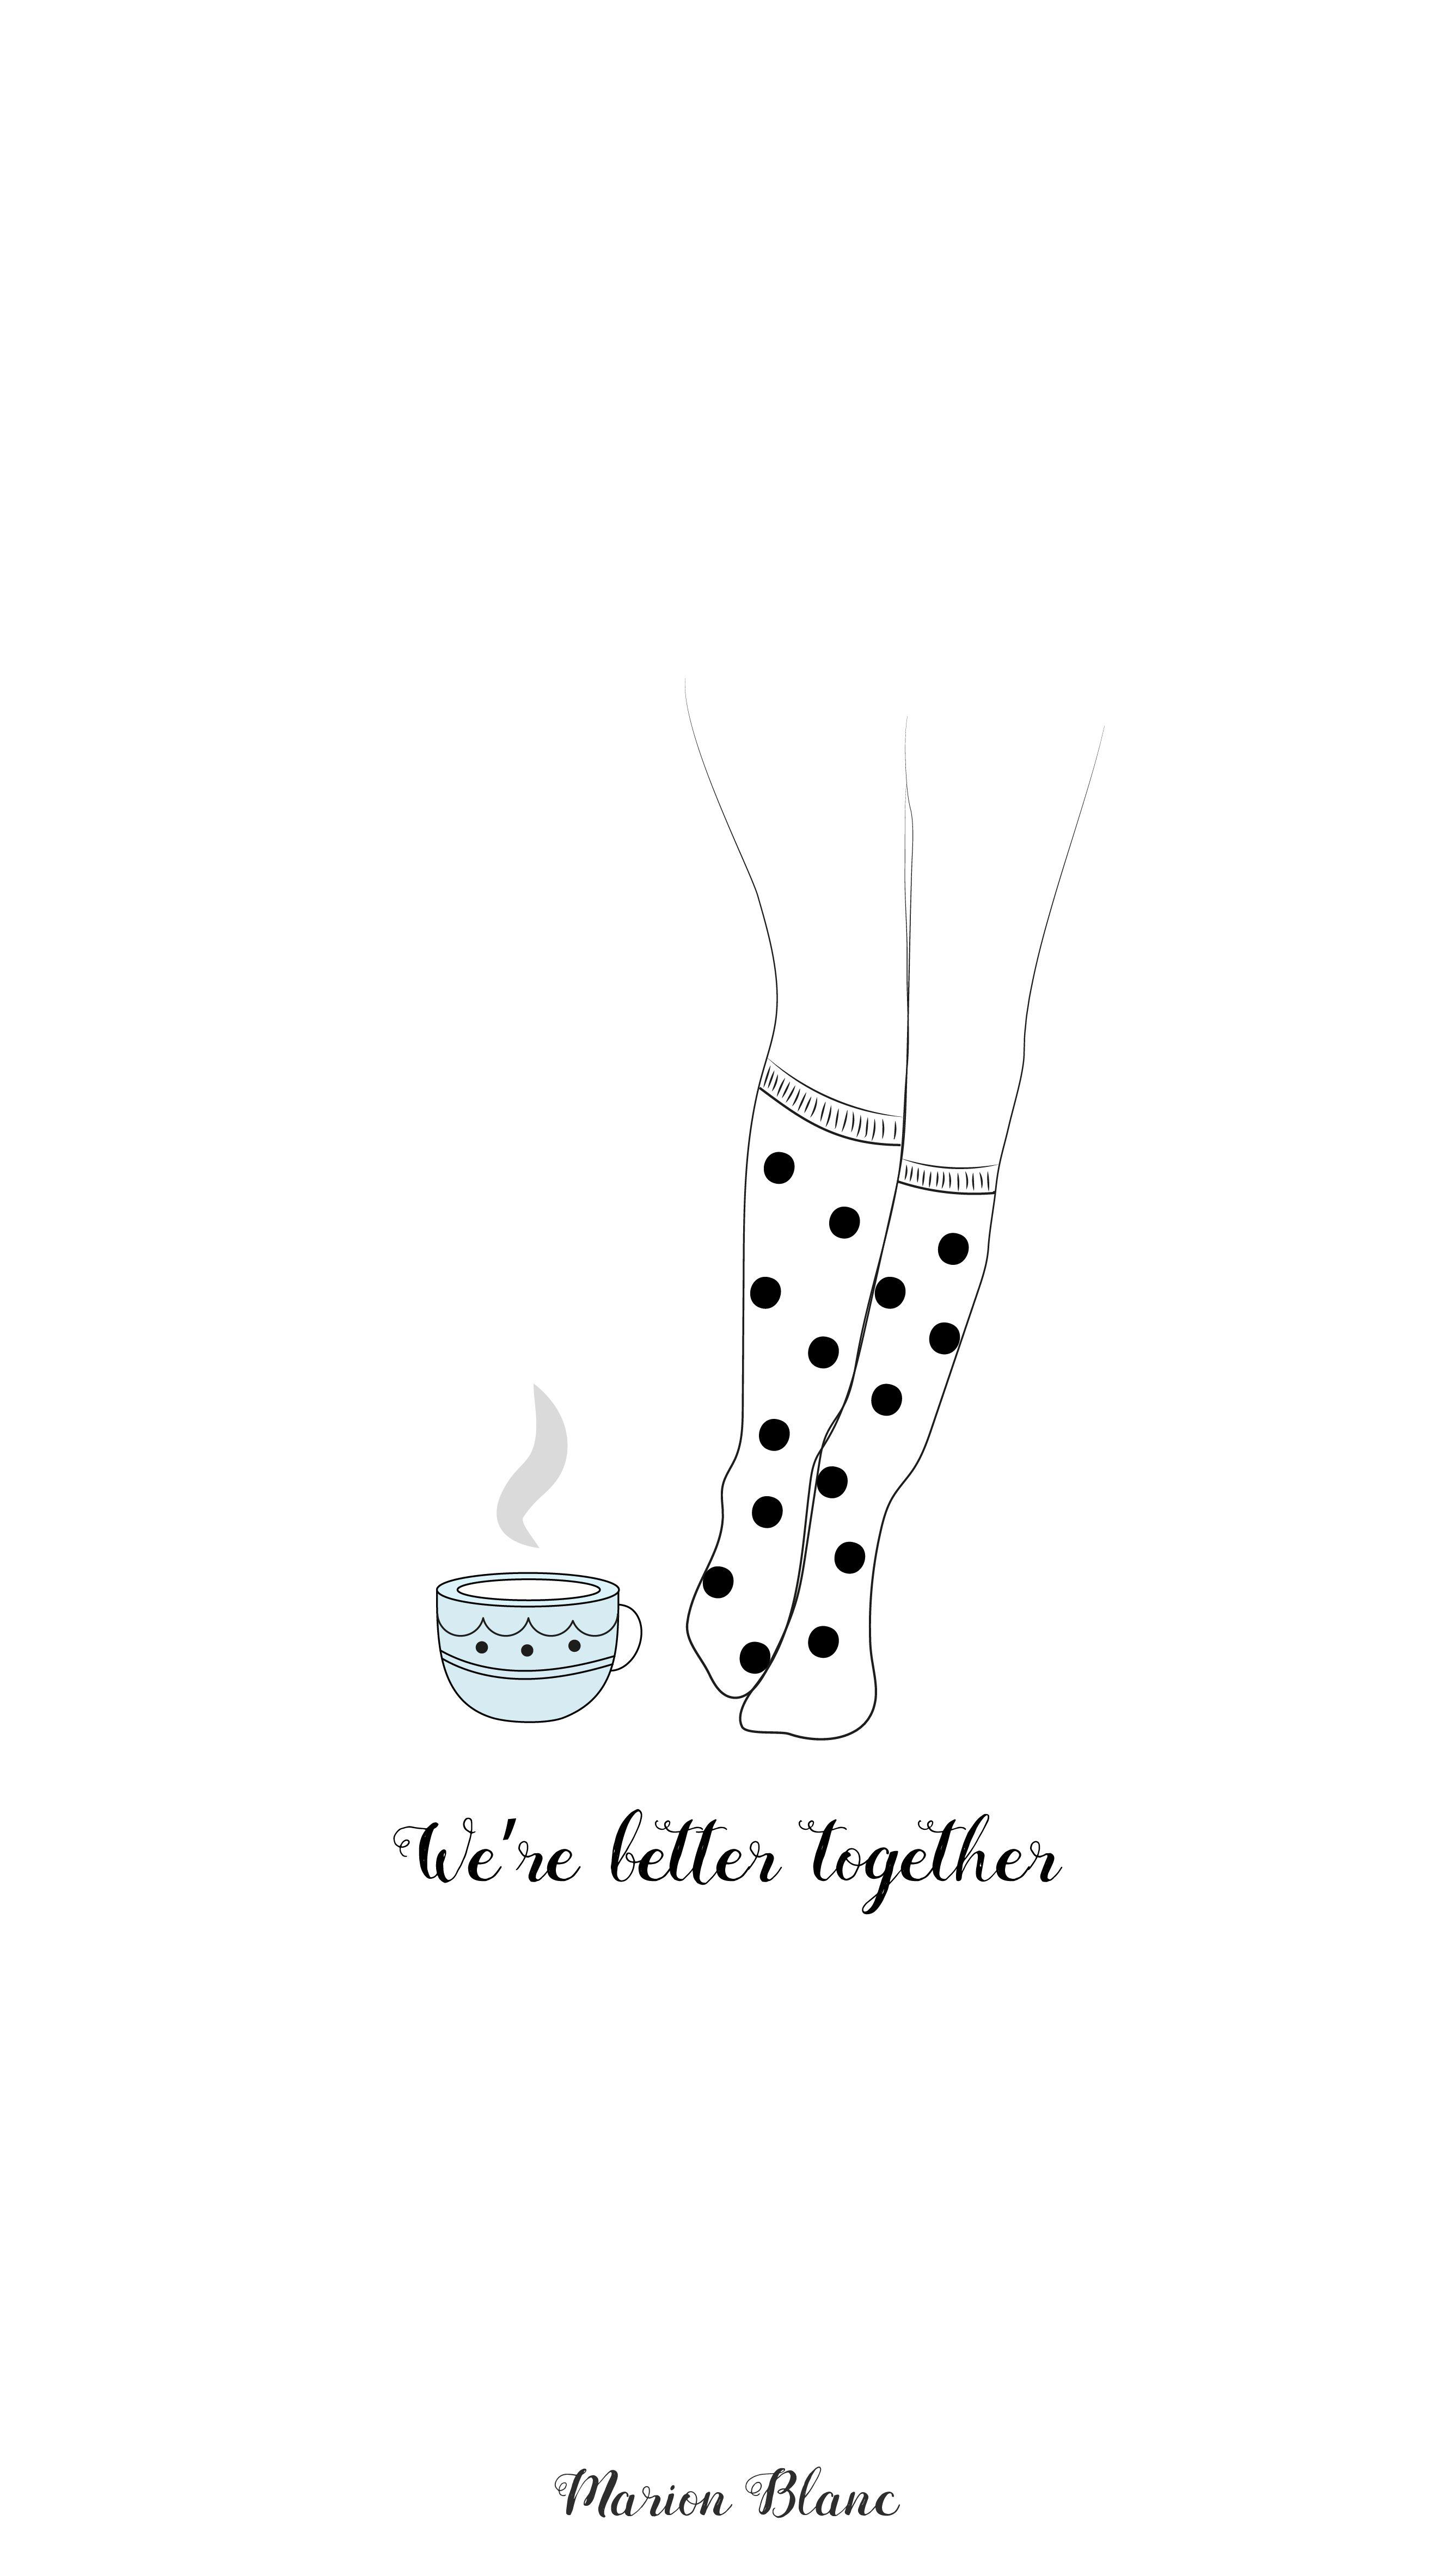 tea and socks wallpaper iphone - Marion Blanc